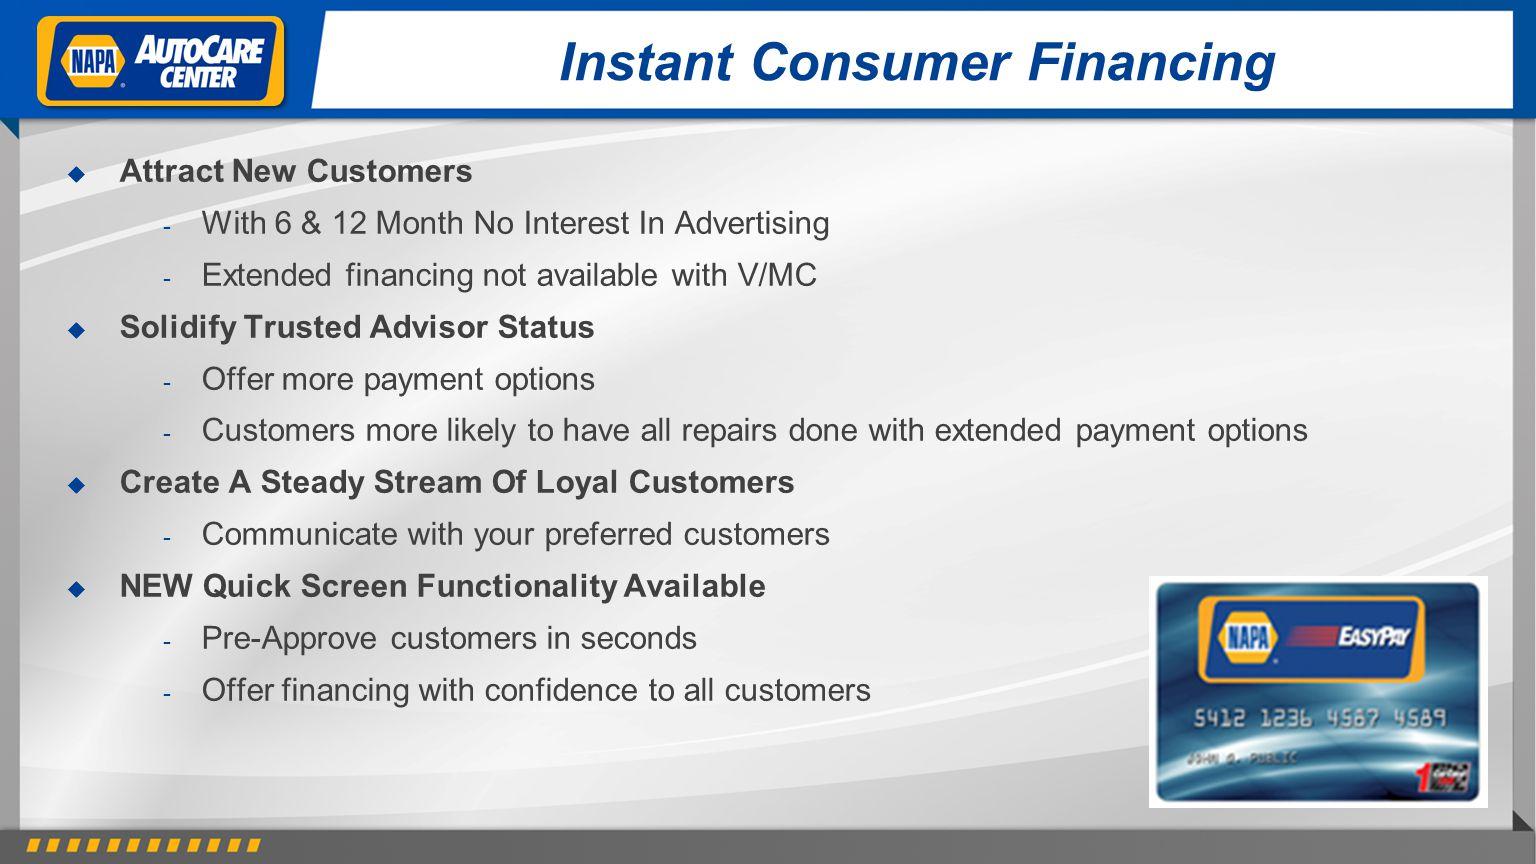 Instant Consumer Financing